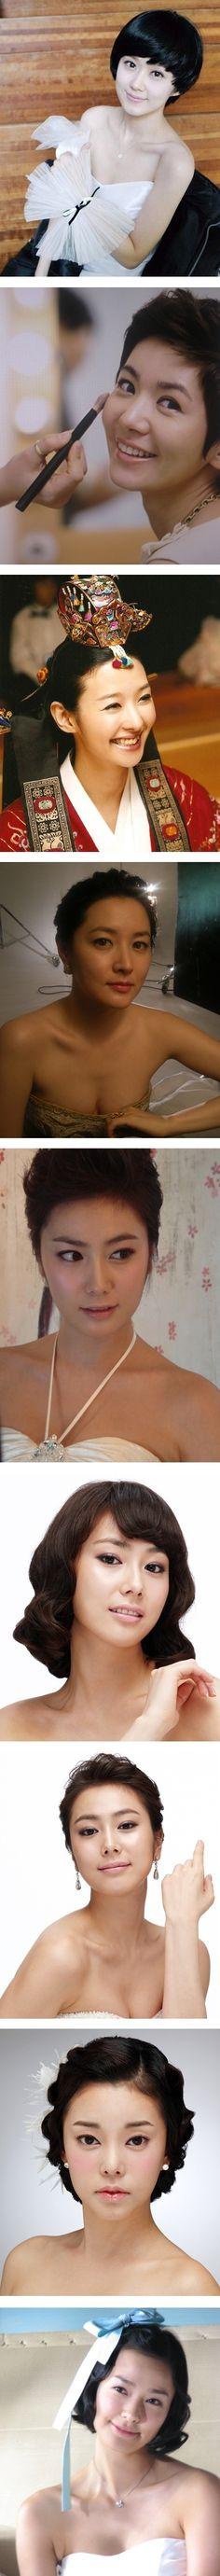 Korea Pre Wedding Photoshoot Review by WeddingRitz.com »  Jakeunchai (wedding make-up & hair in Korea)